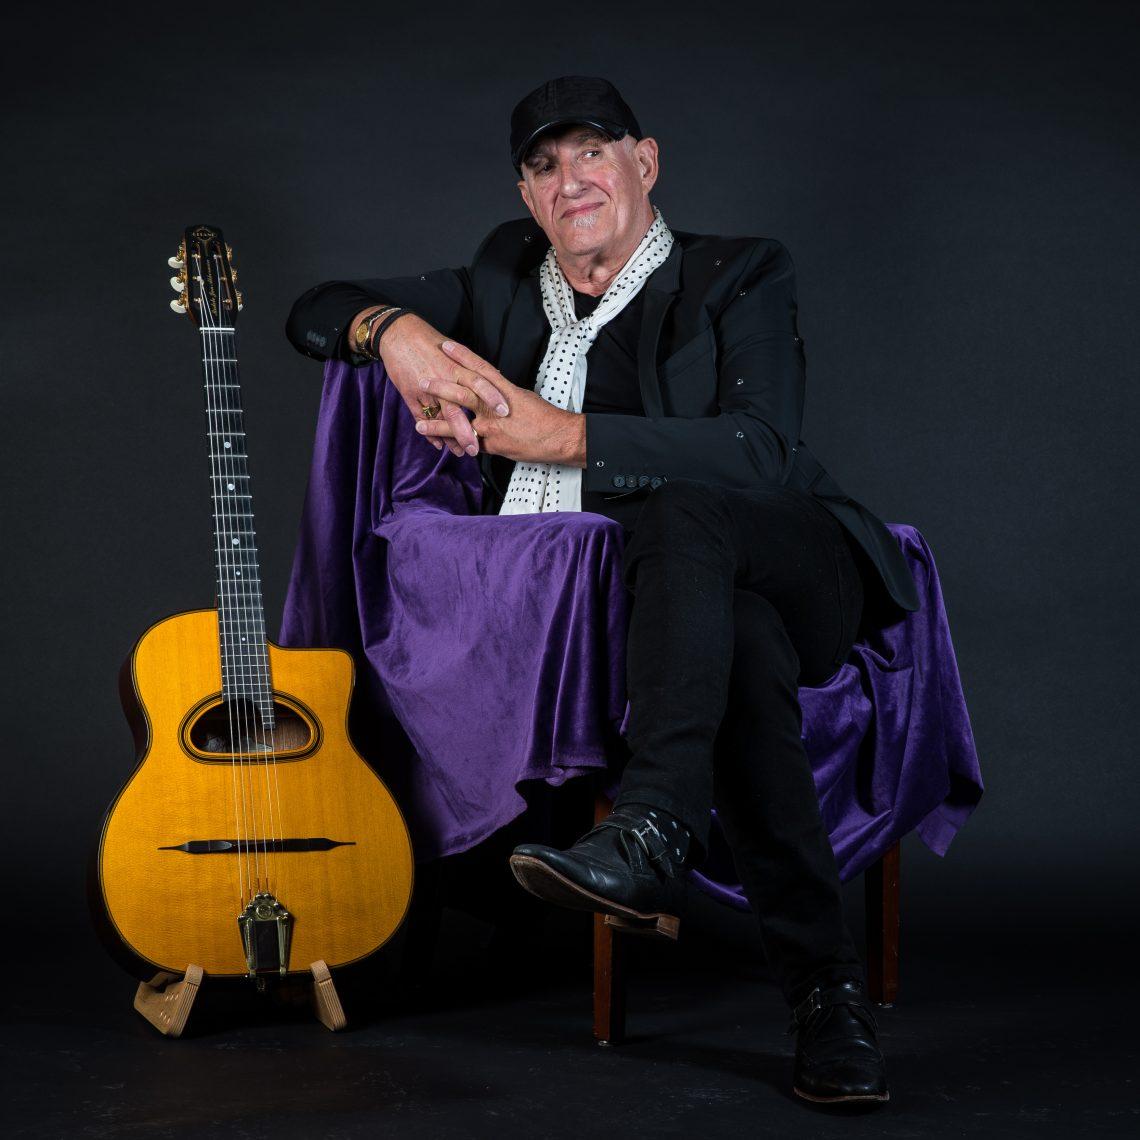 Jan Akkerman first new studio album in 8 years – Close Beauty – 25 October